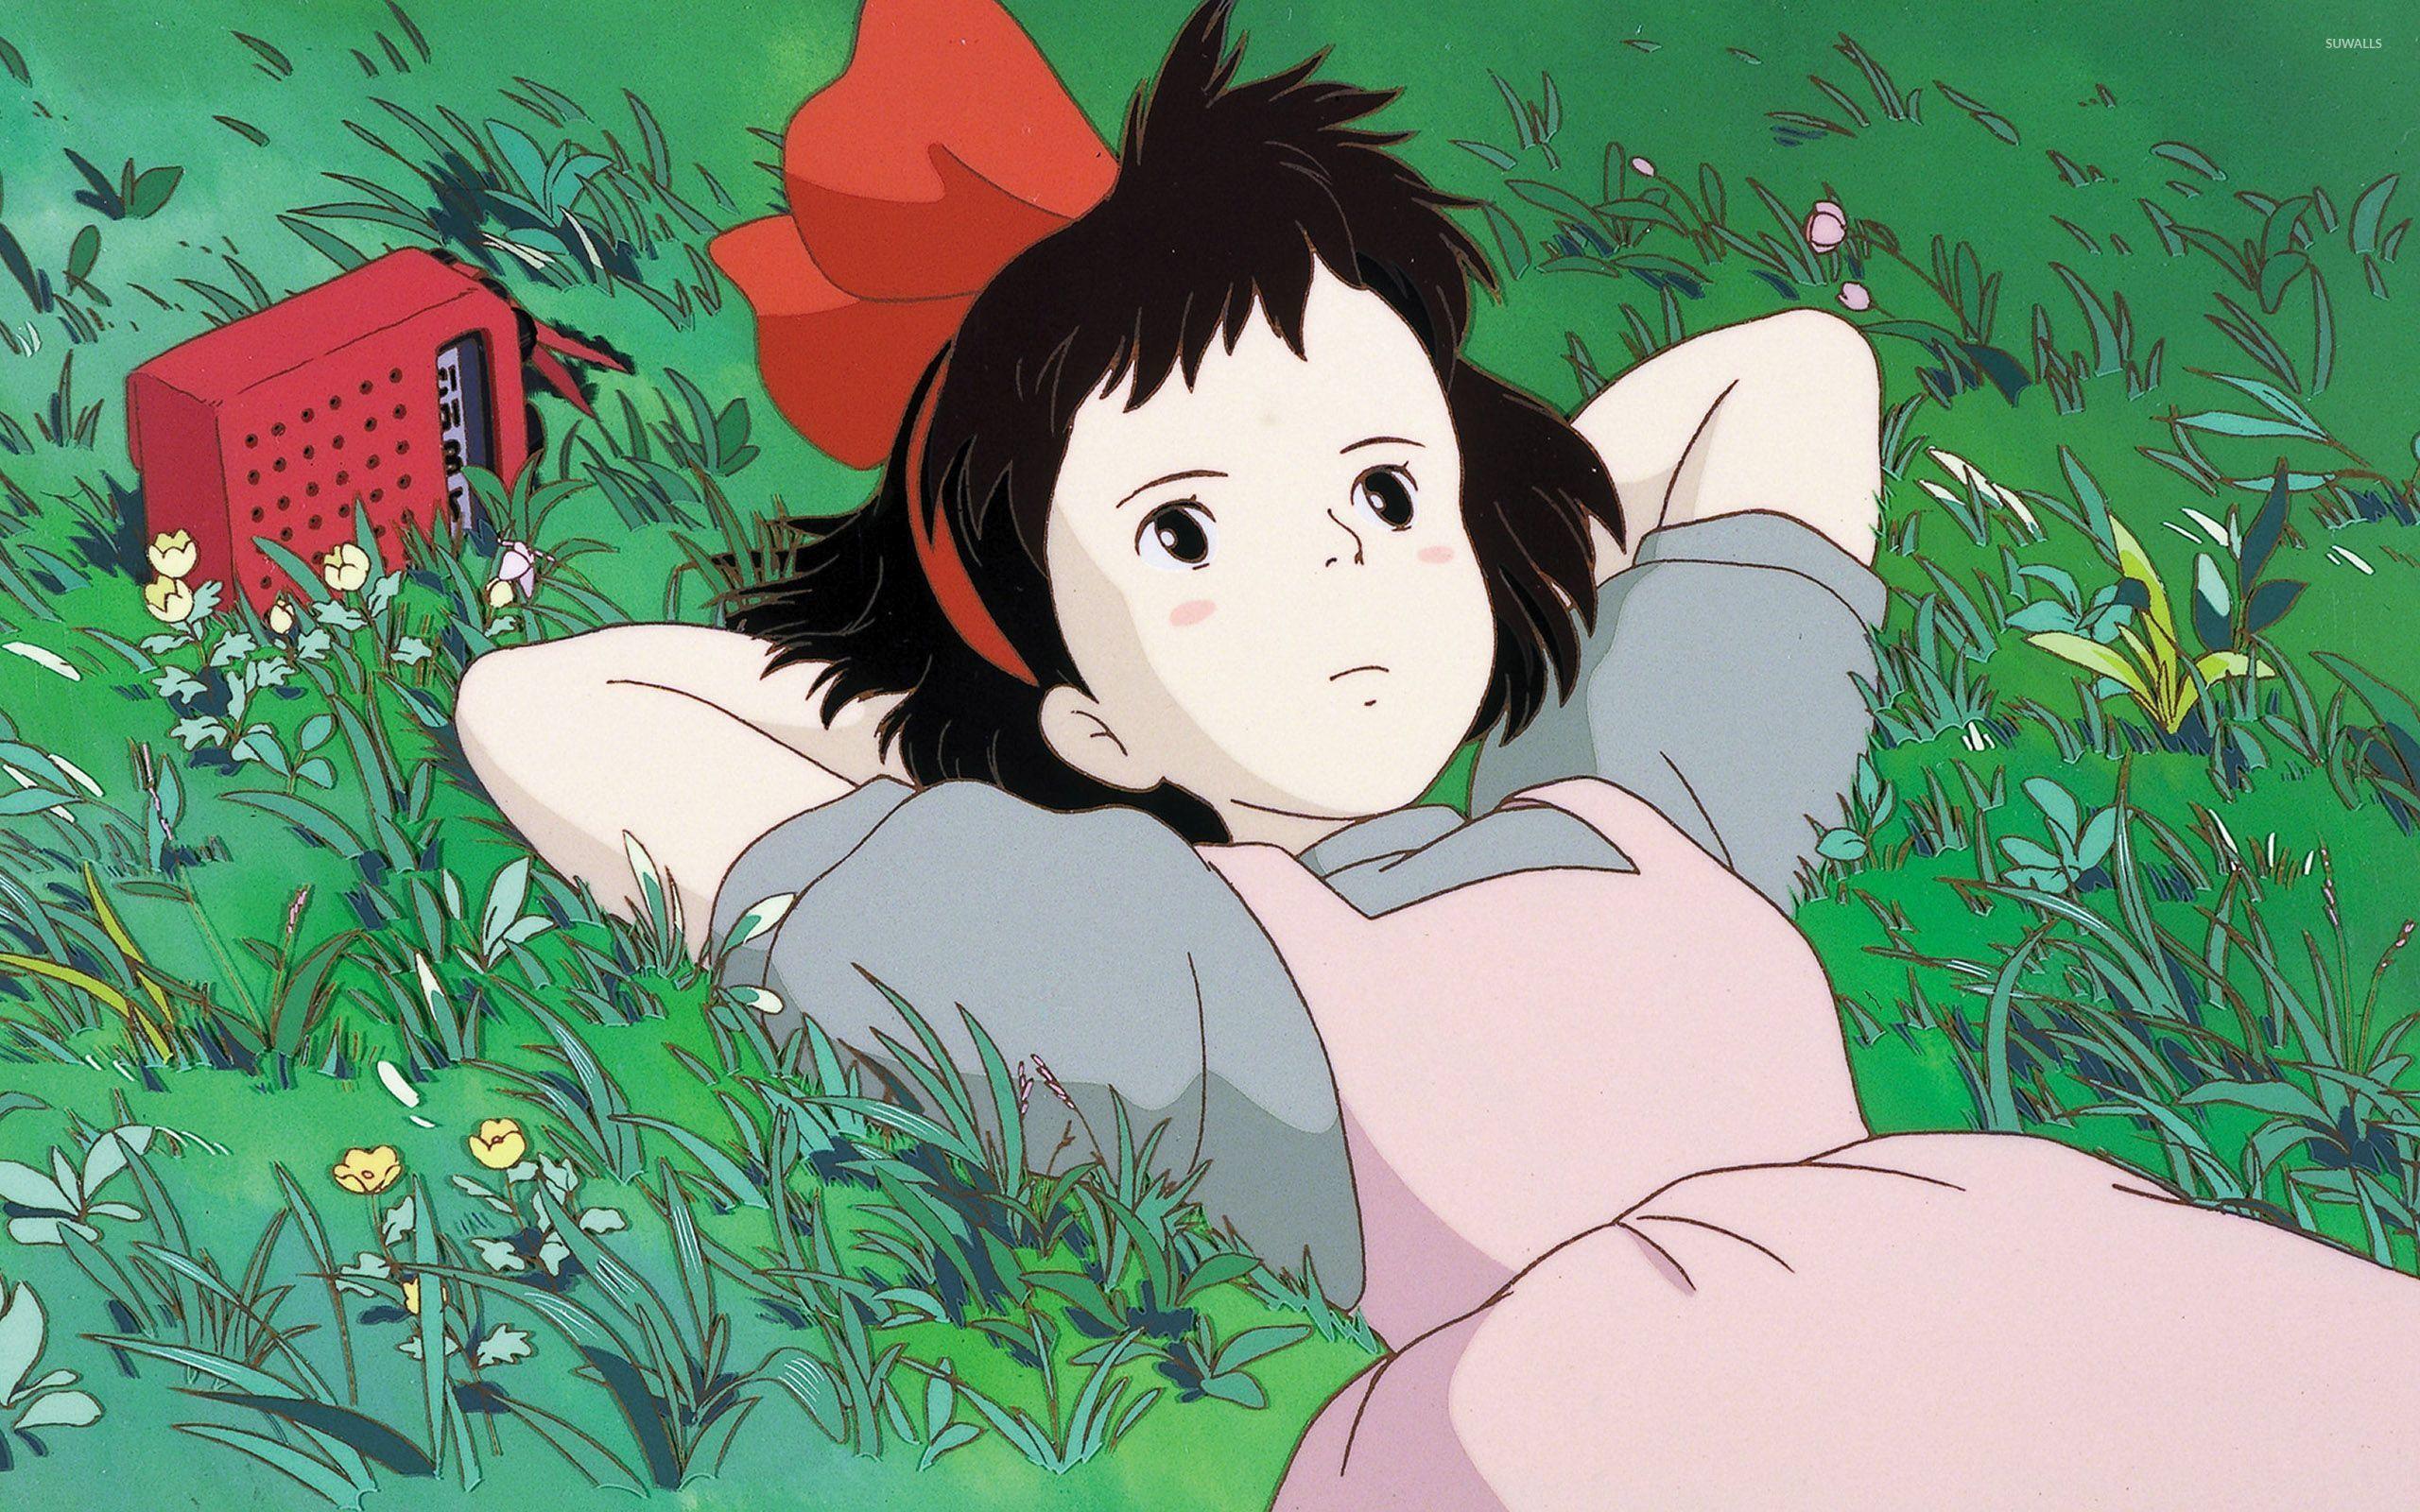 Kiki Kiki S Delivery Service Wallpaper Anime Wallpapers 36733